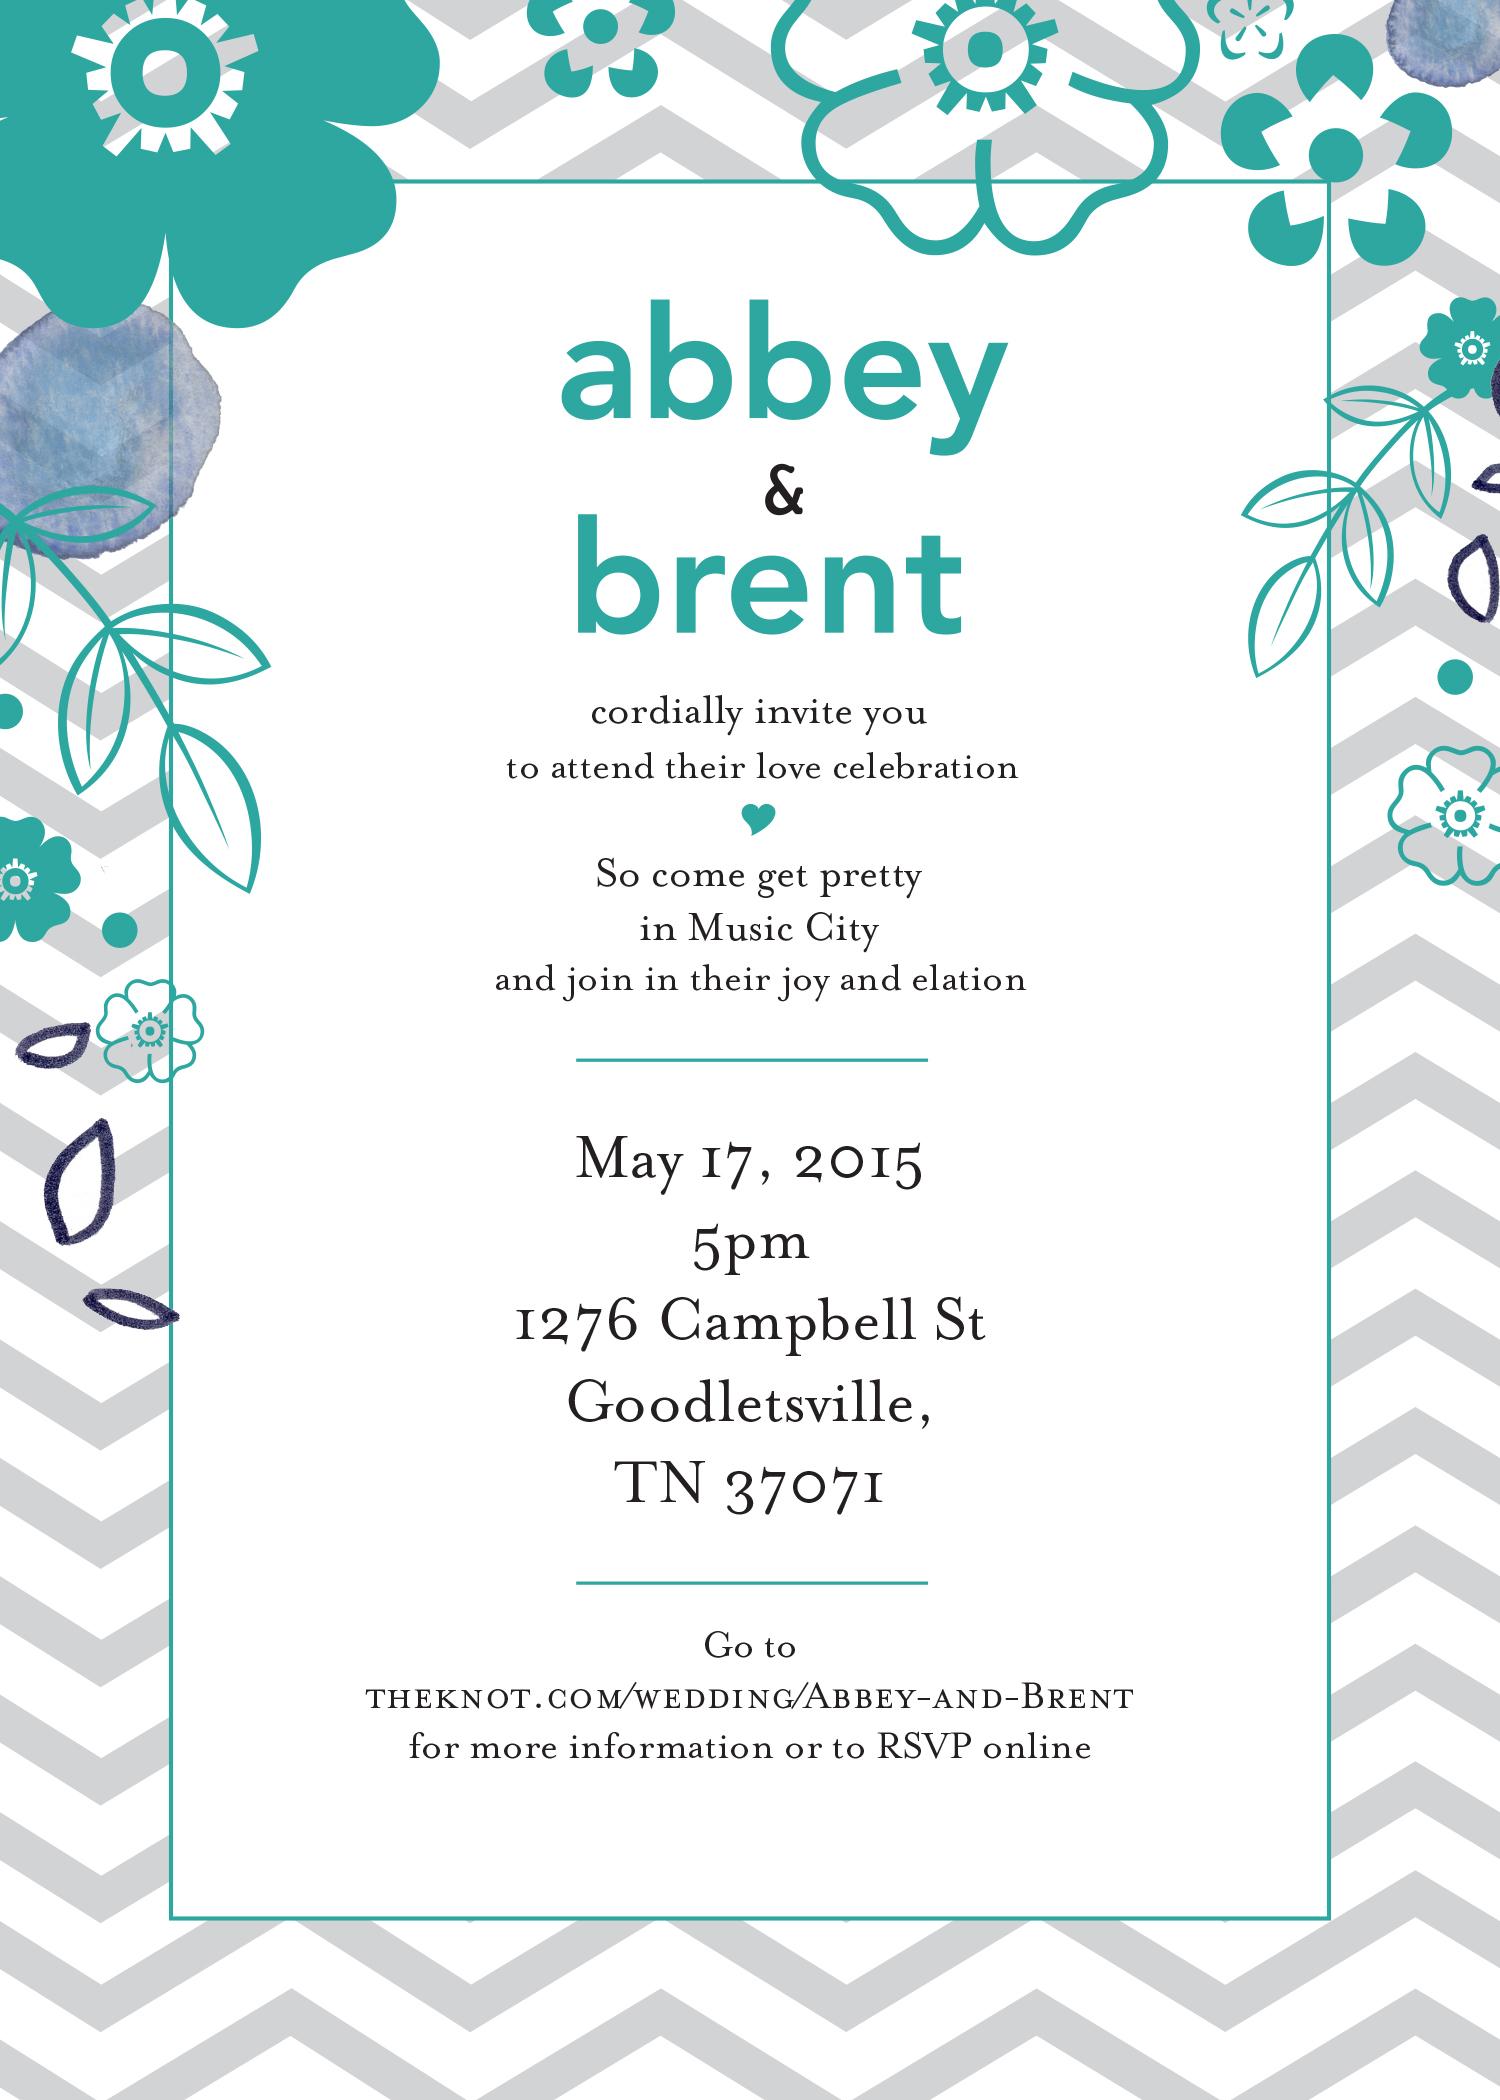 Abbey_invite_port.jpg